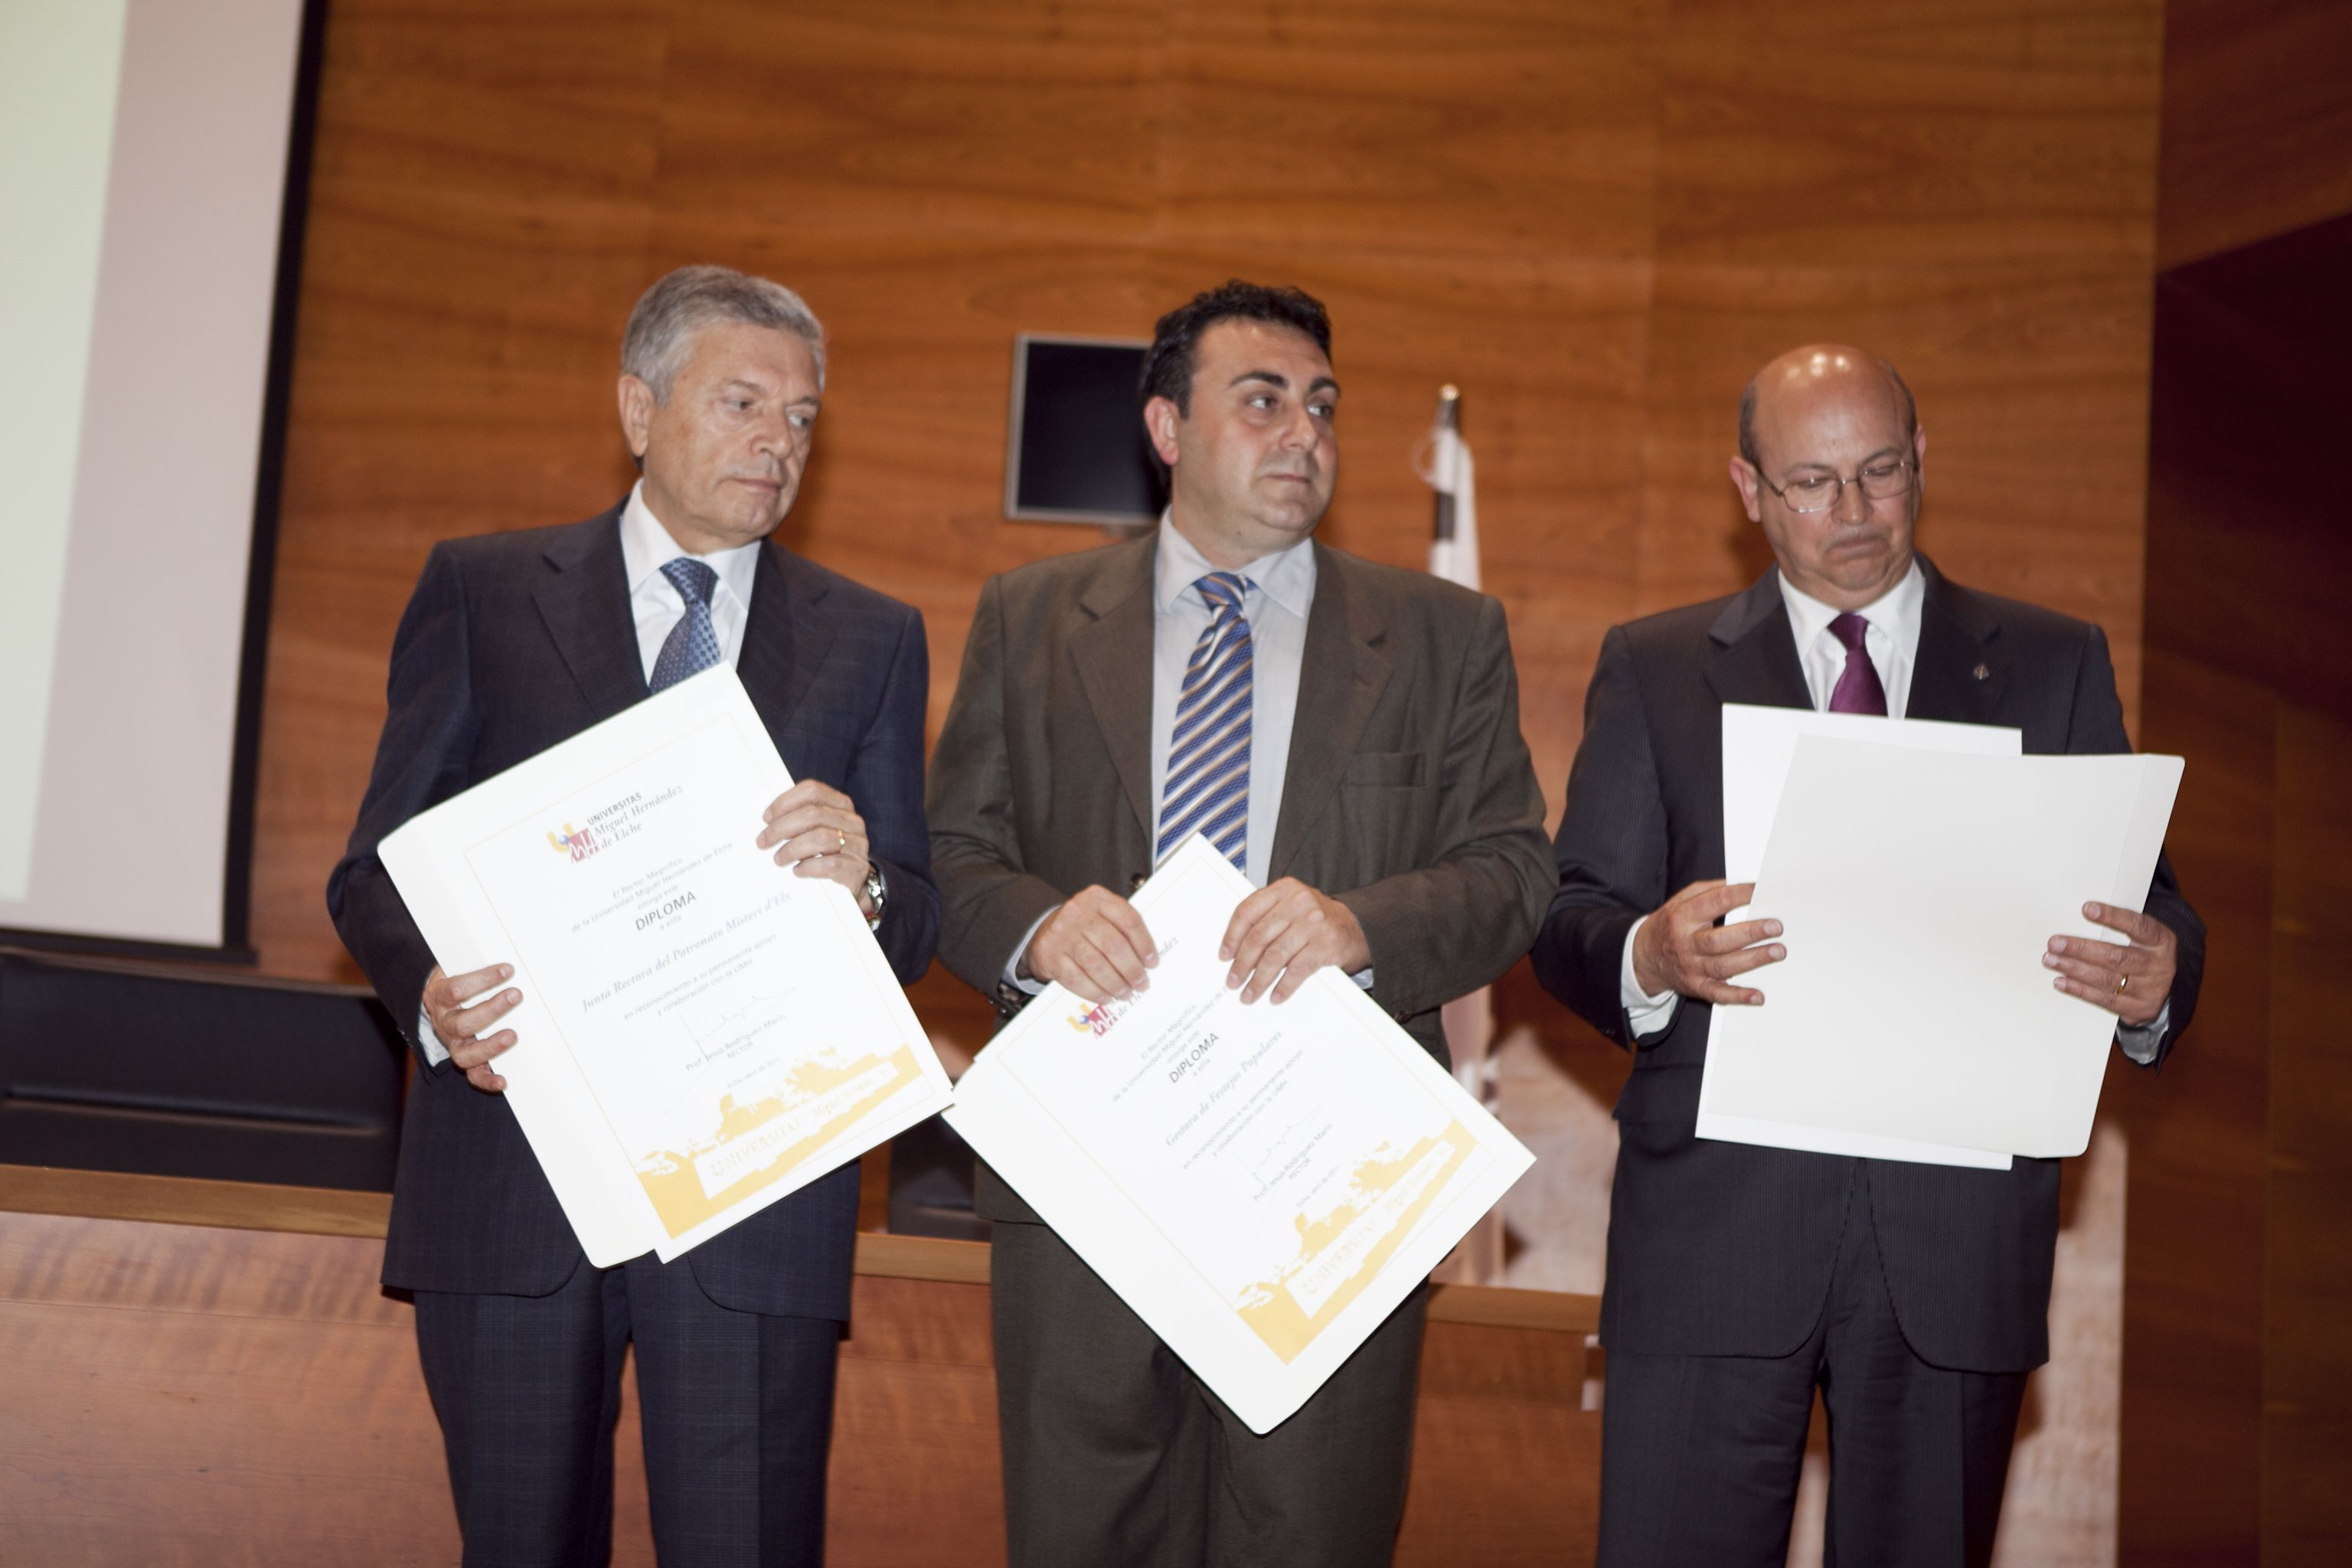 umh-diplomas-rector_mg_6523.jpg